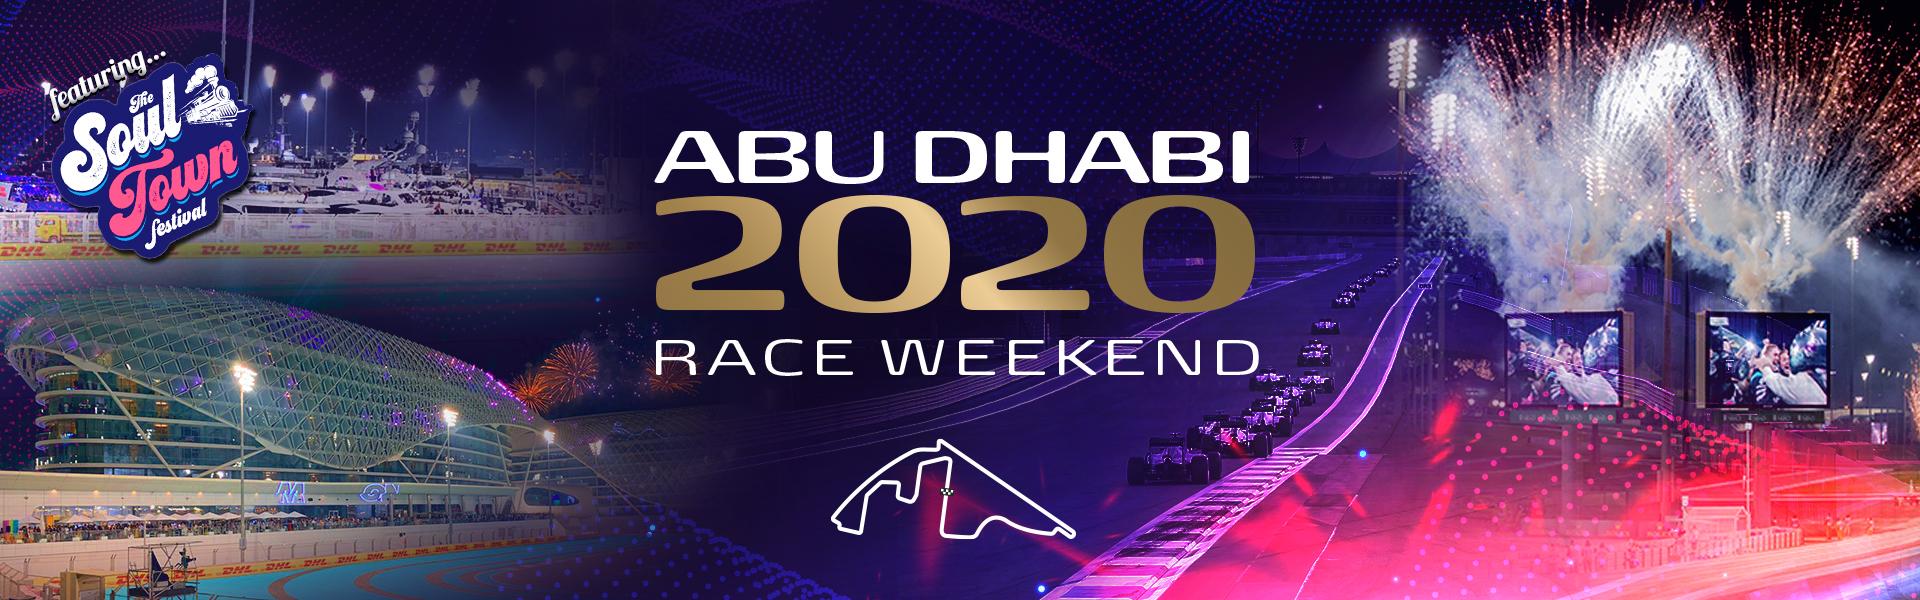 2020-Banners-Abu-Dhabi copy